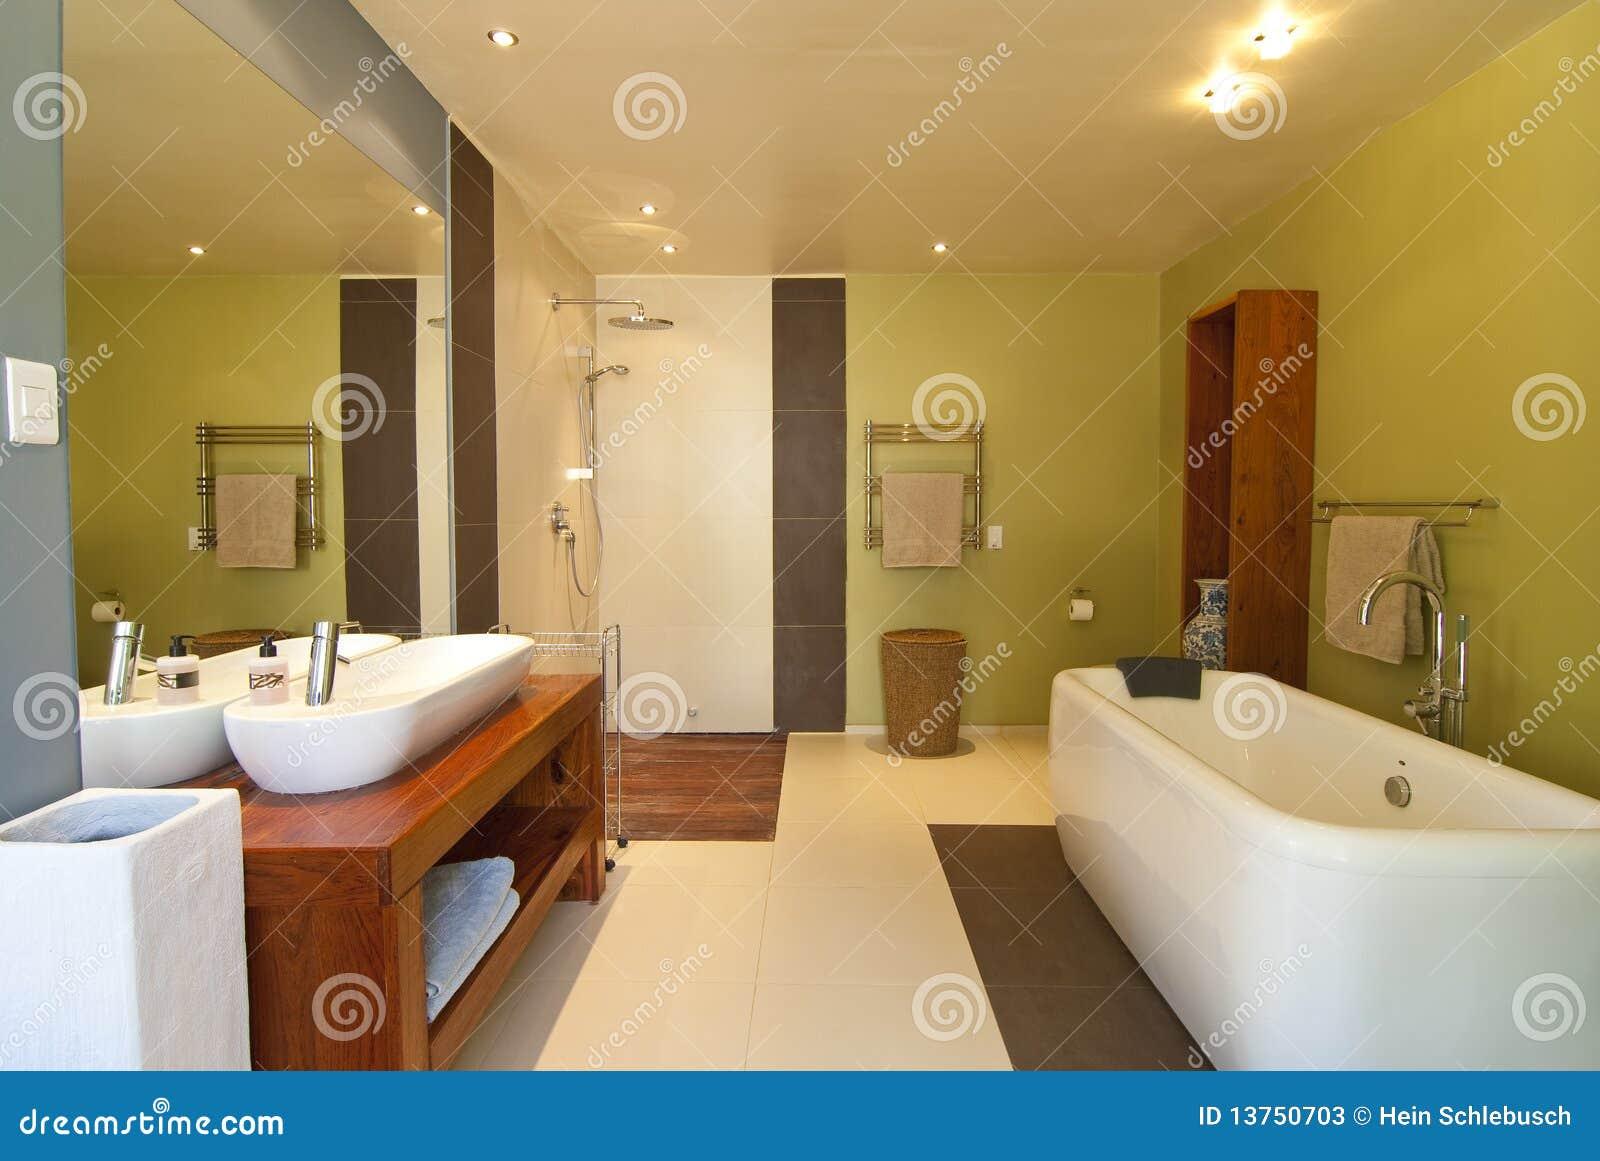 Moderne badkamers stock afbeelding. Afbeelding bestaande uit ...